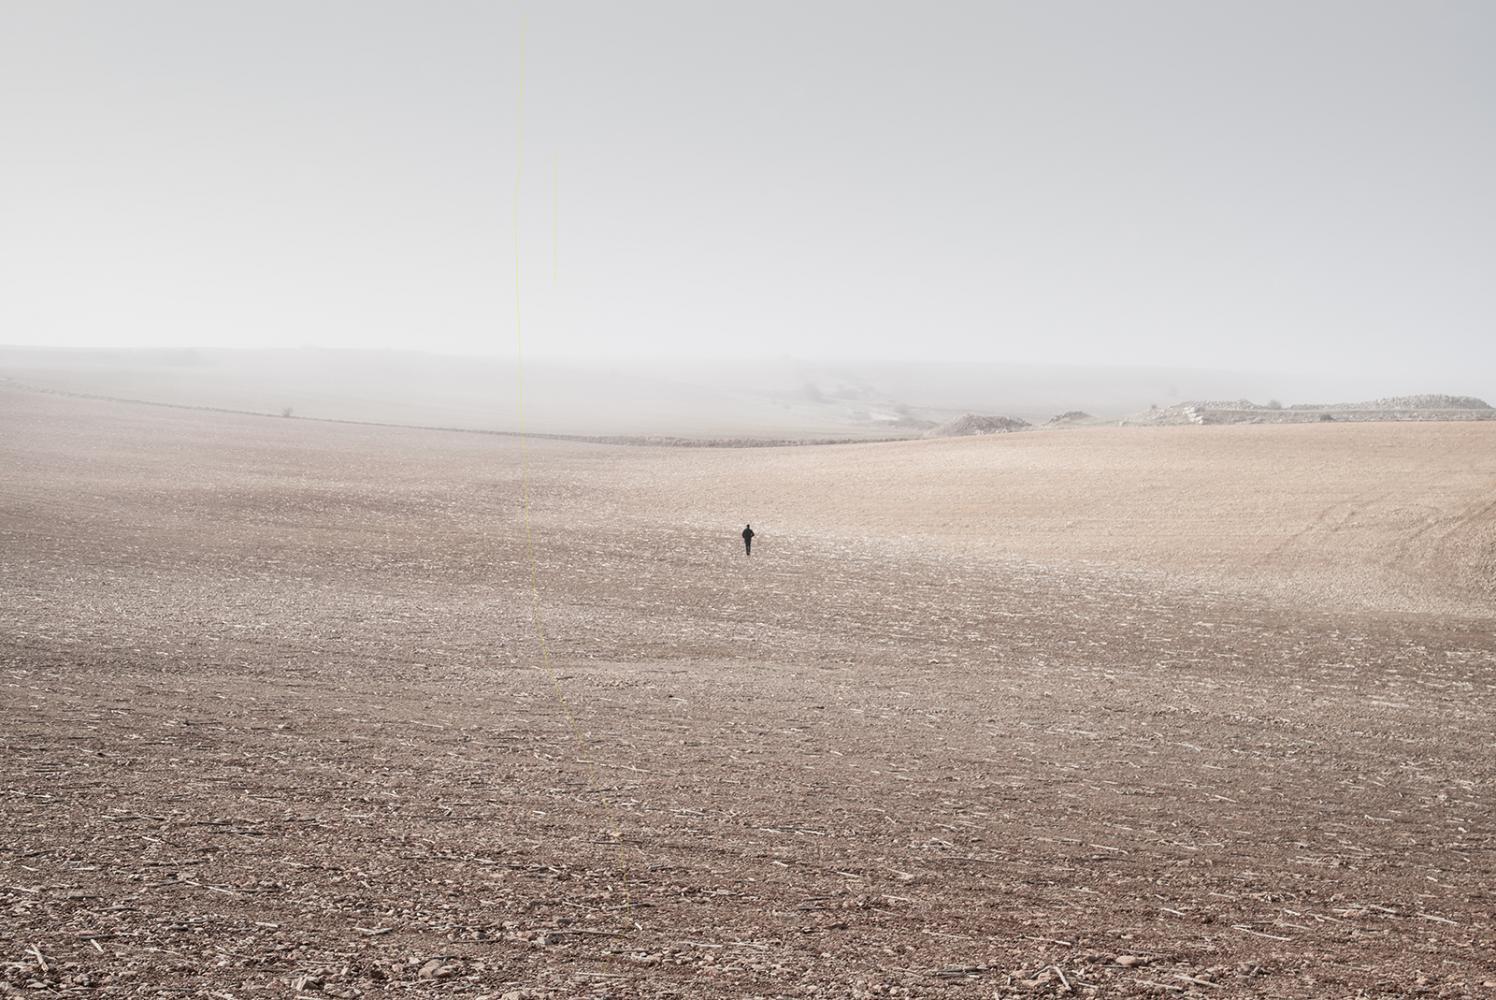 Photography image - Loading The_Last_Man_on_Earth_02.jpg